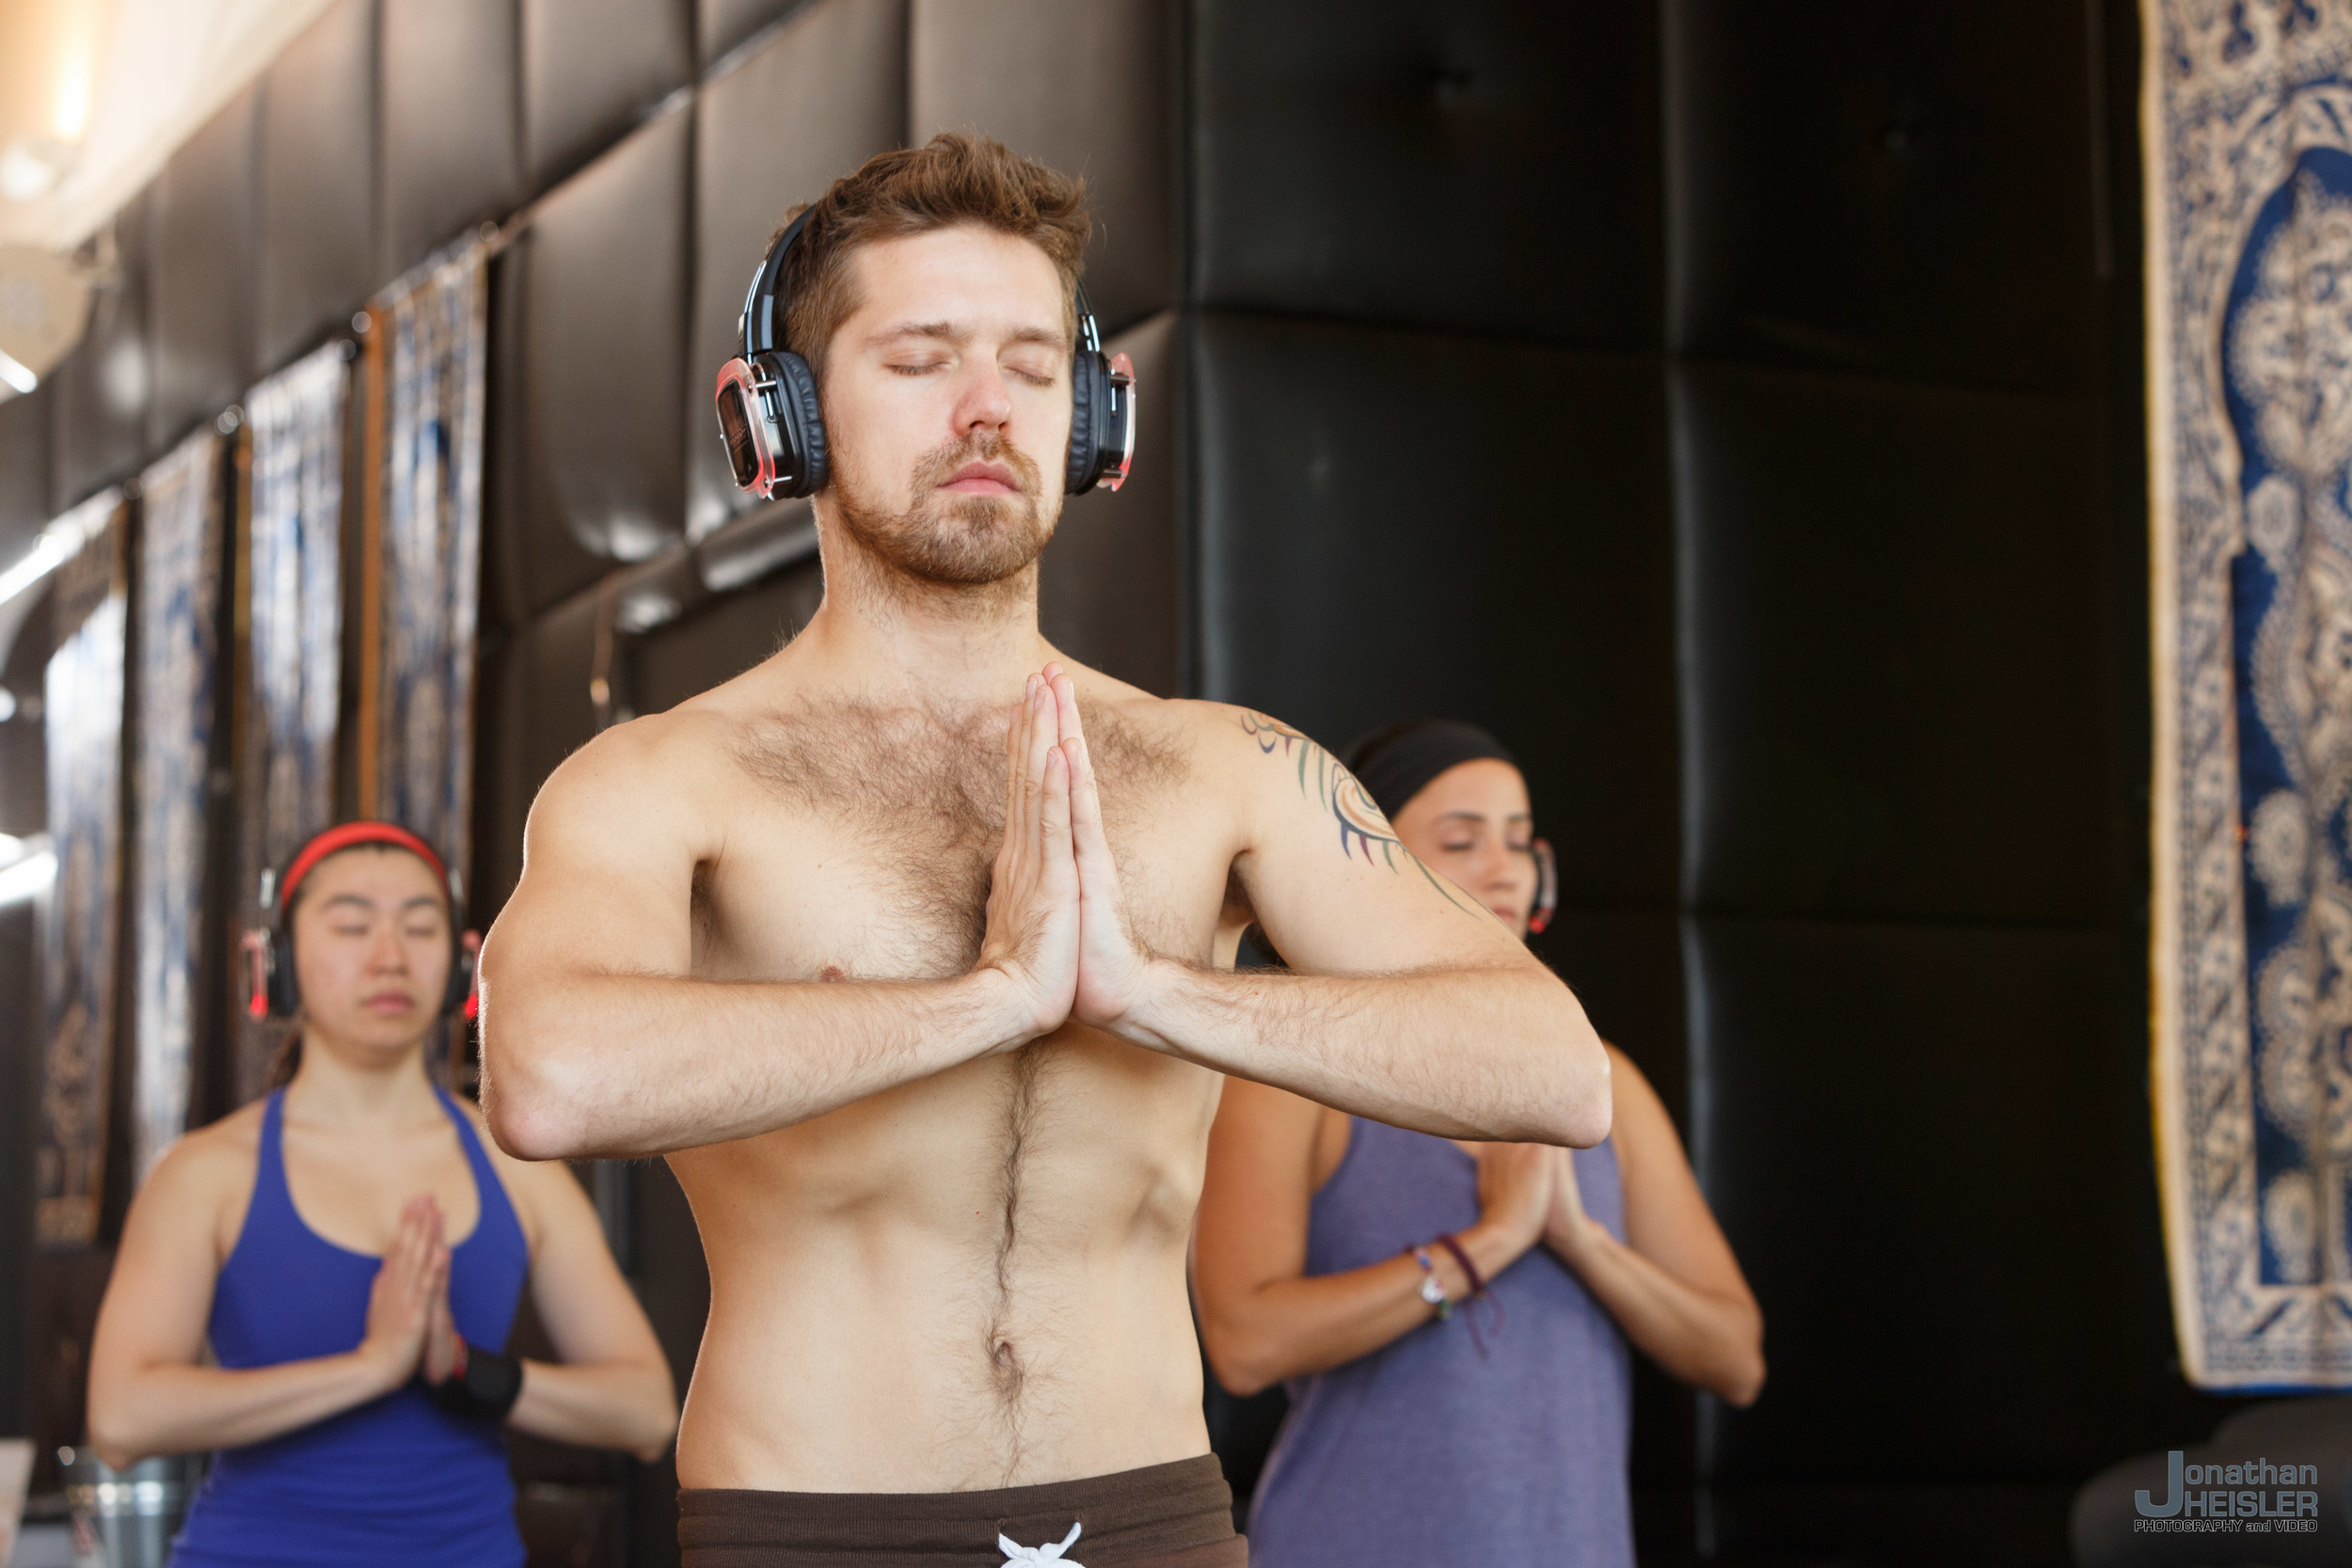 Reebok NYC Yoga_ Gansevoort Hotel NYC __  Jonathan Heisler _ 11.21.2015_021f_5.0.jpg